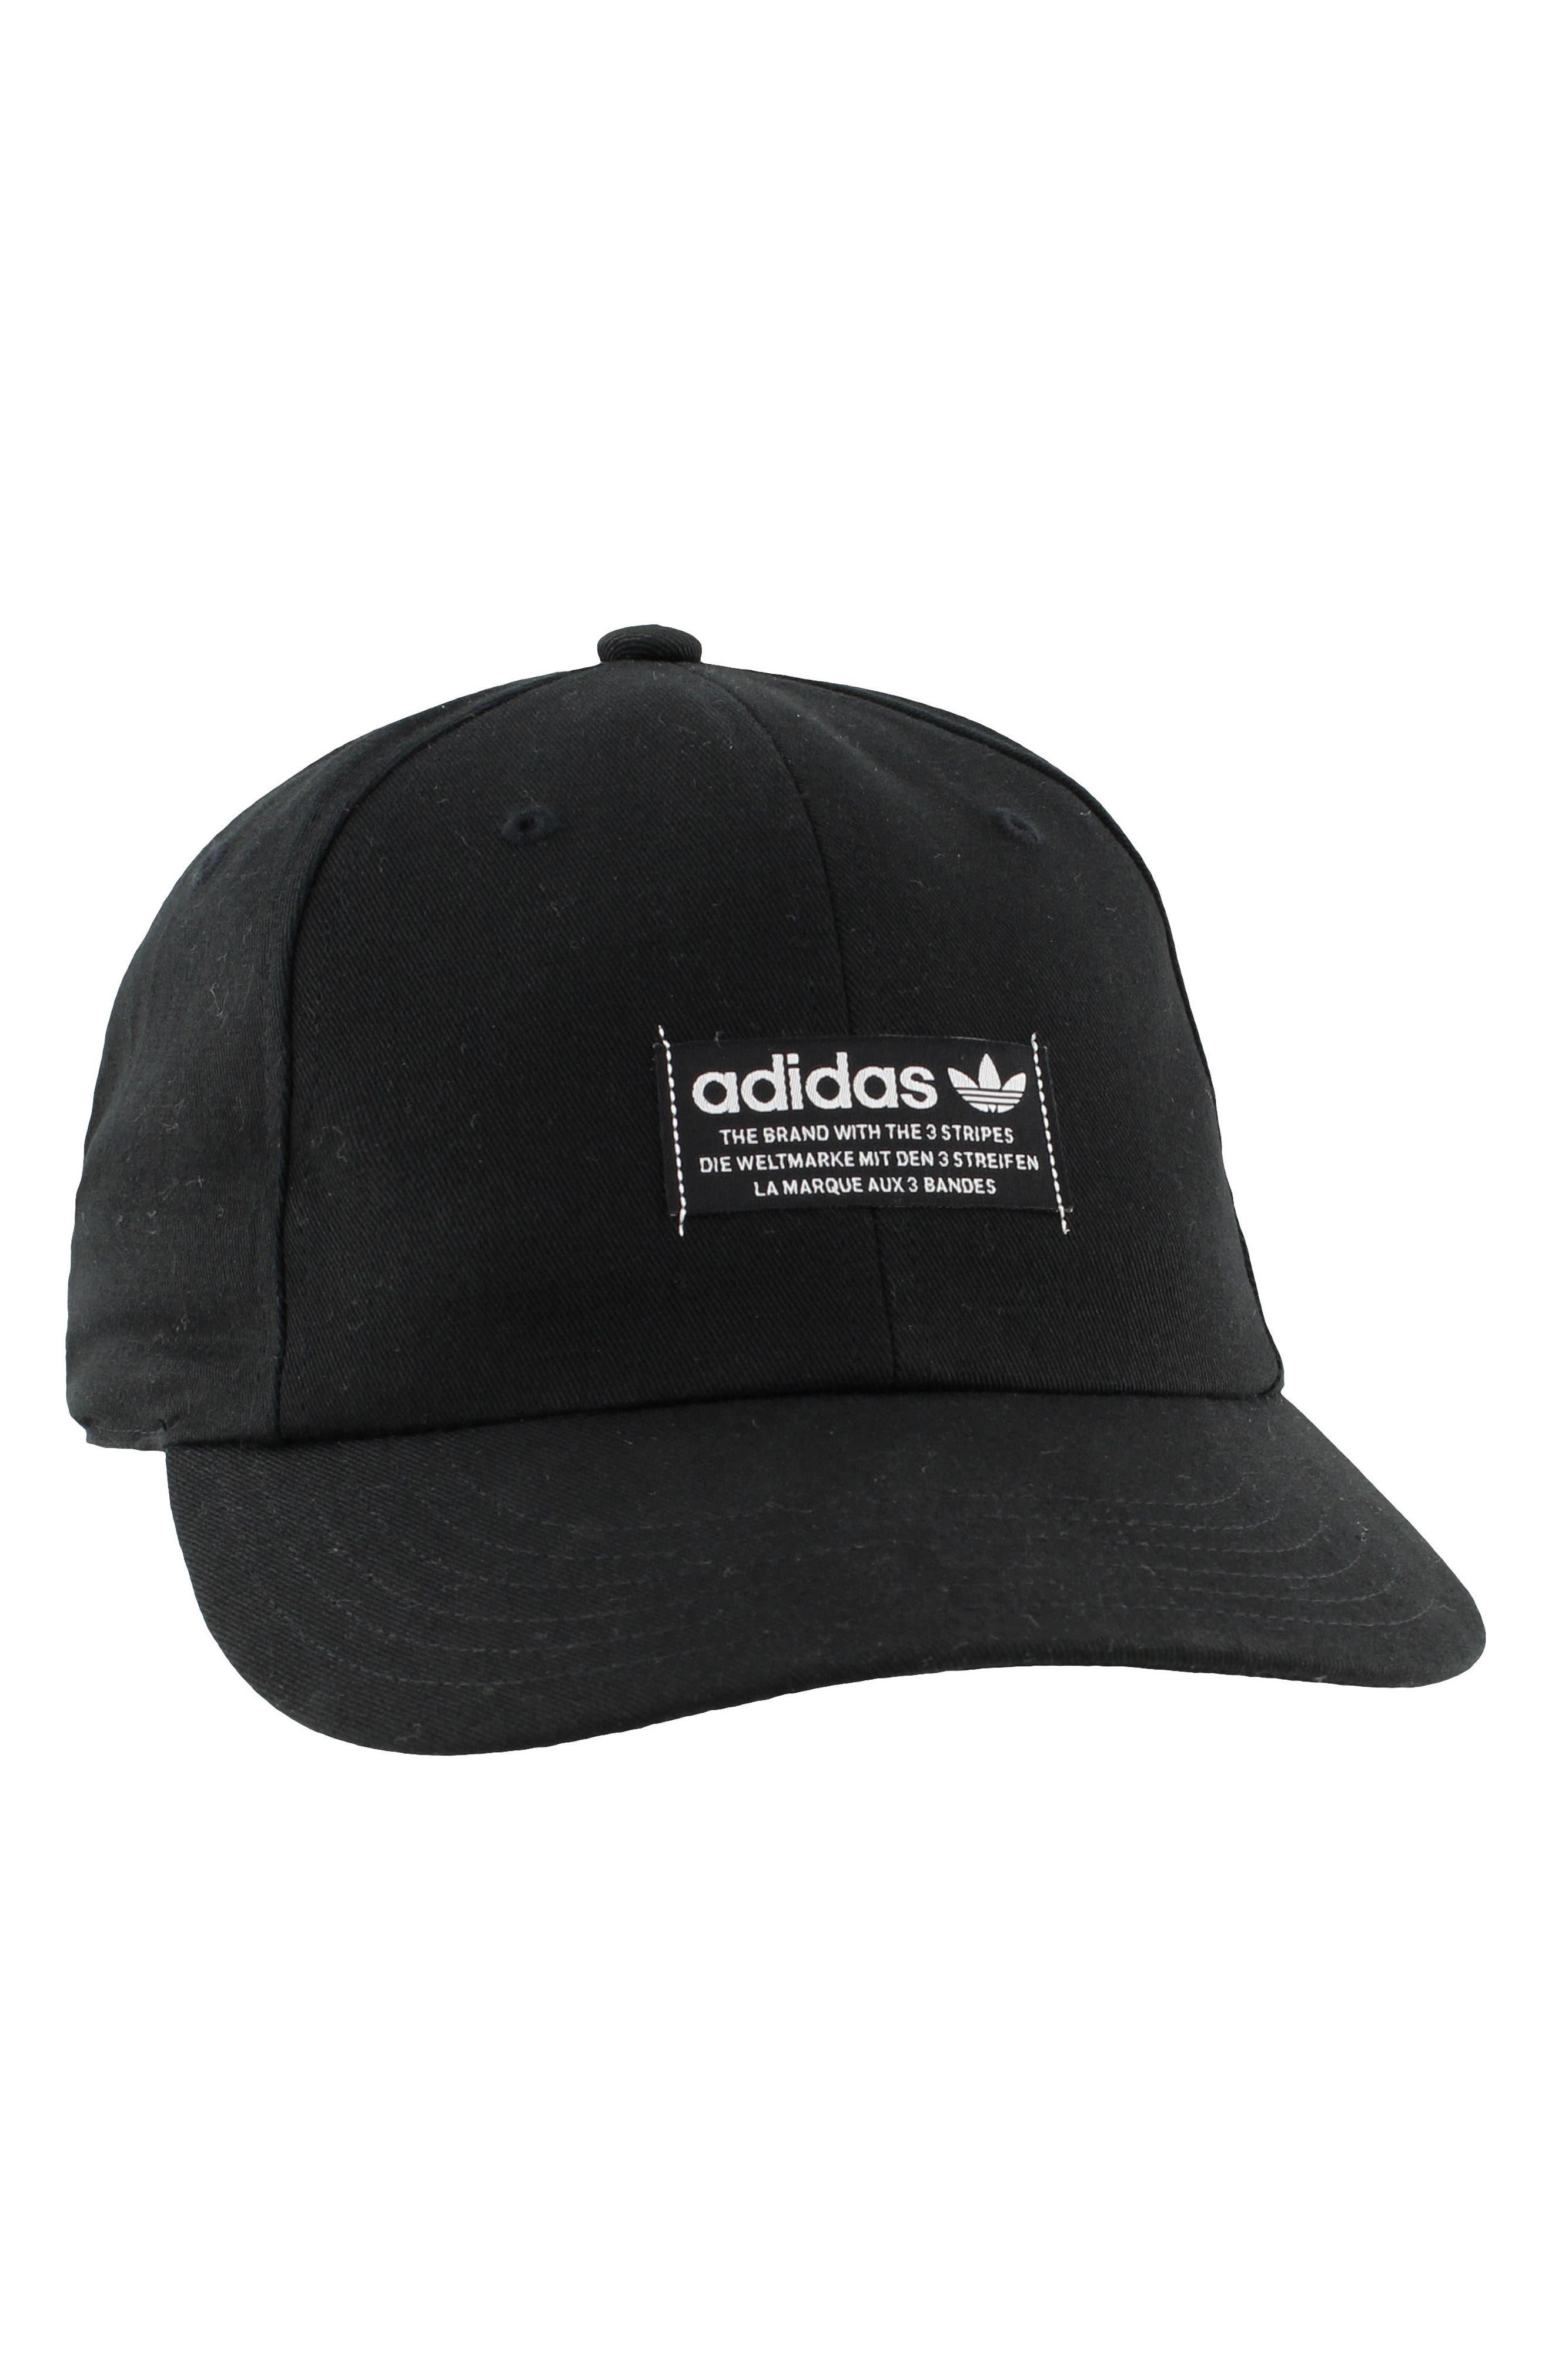 adidas Original Relaxed Patch Ball Cap,                             Alternate thumbnail 2, color,                             Black